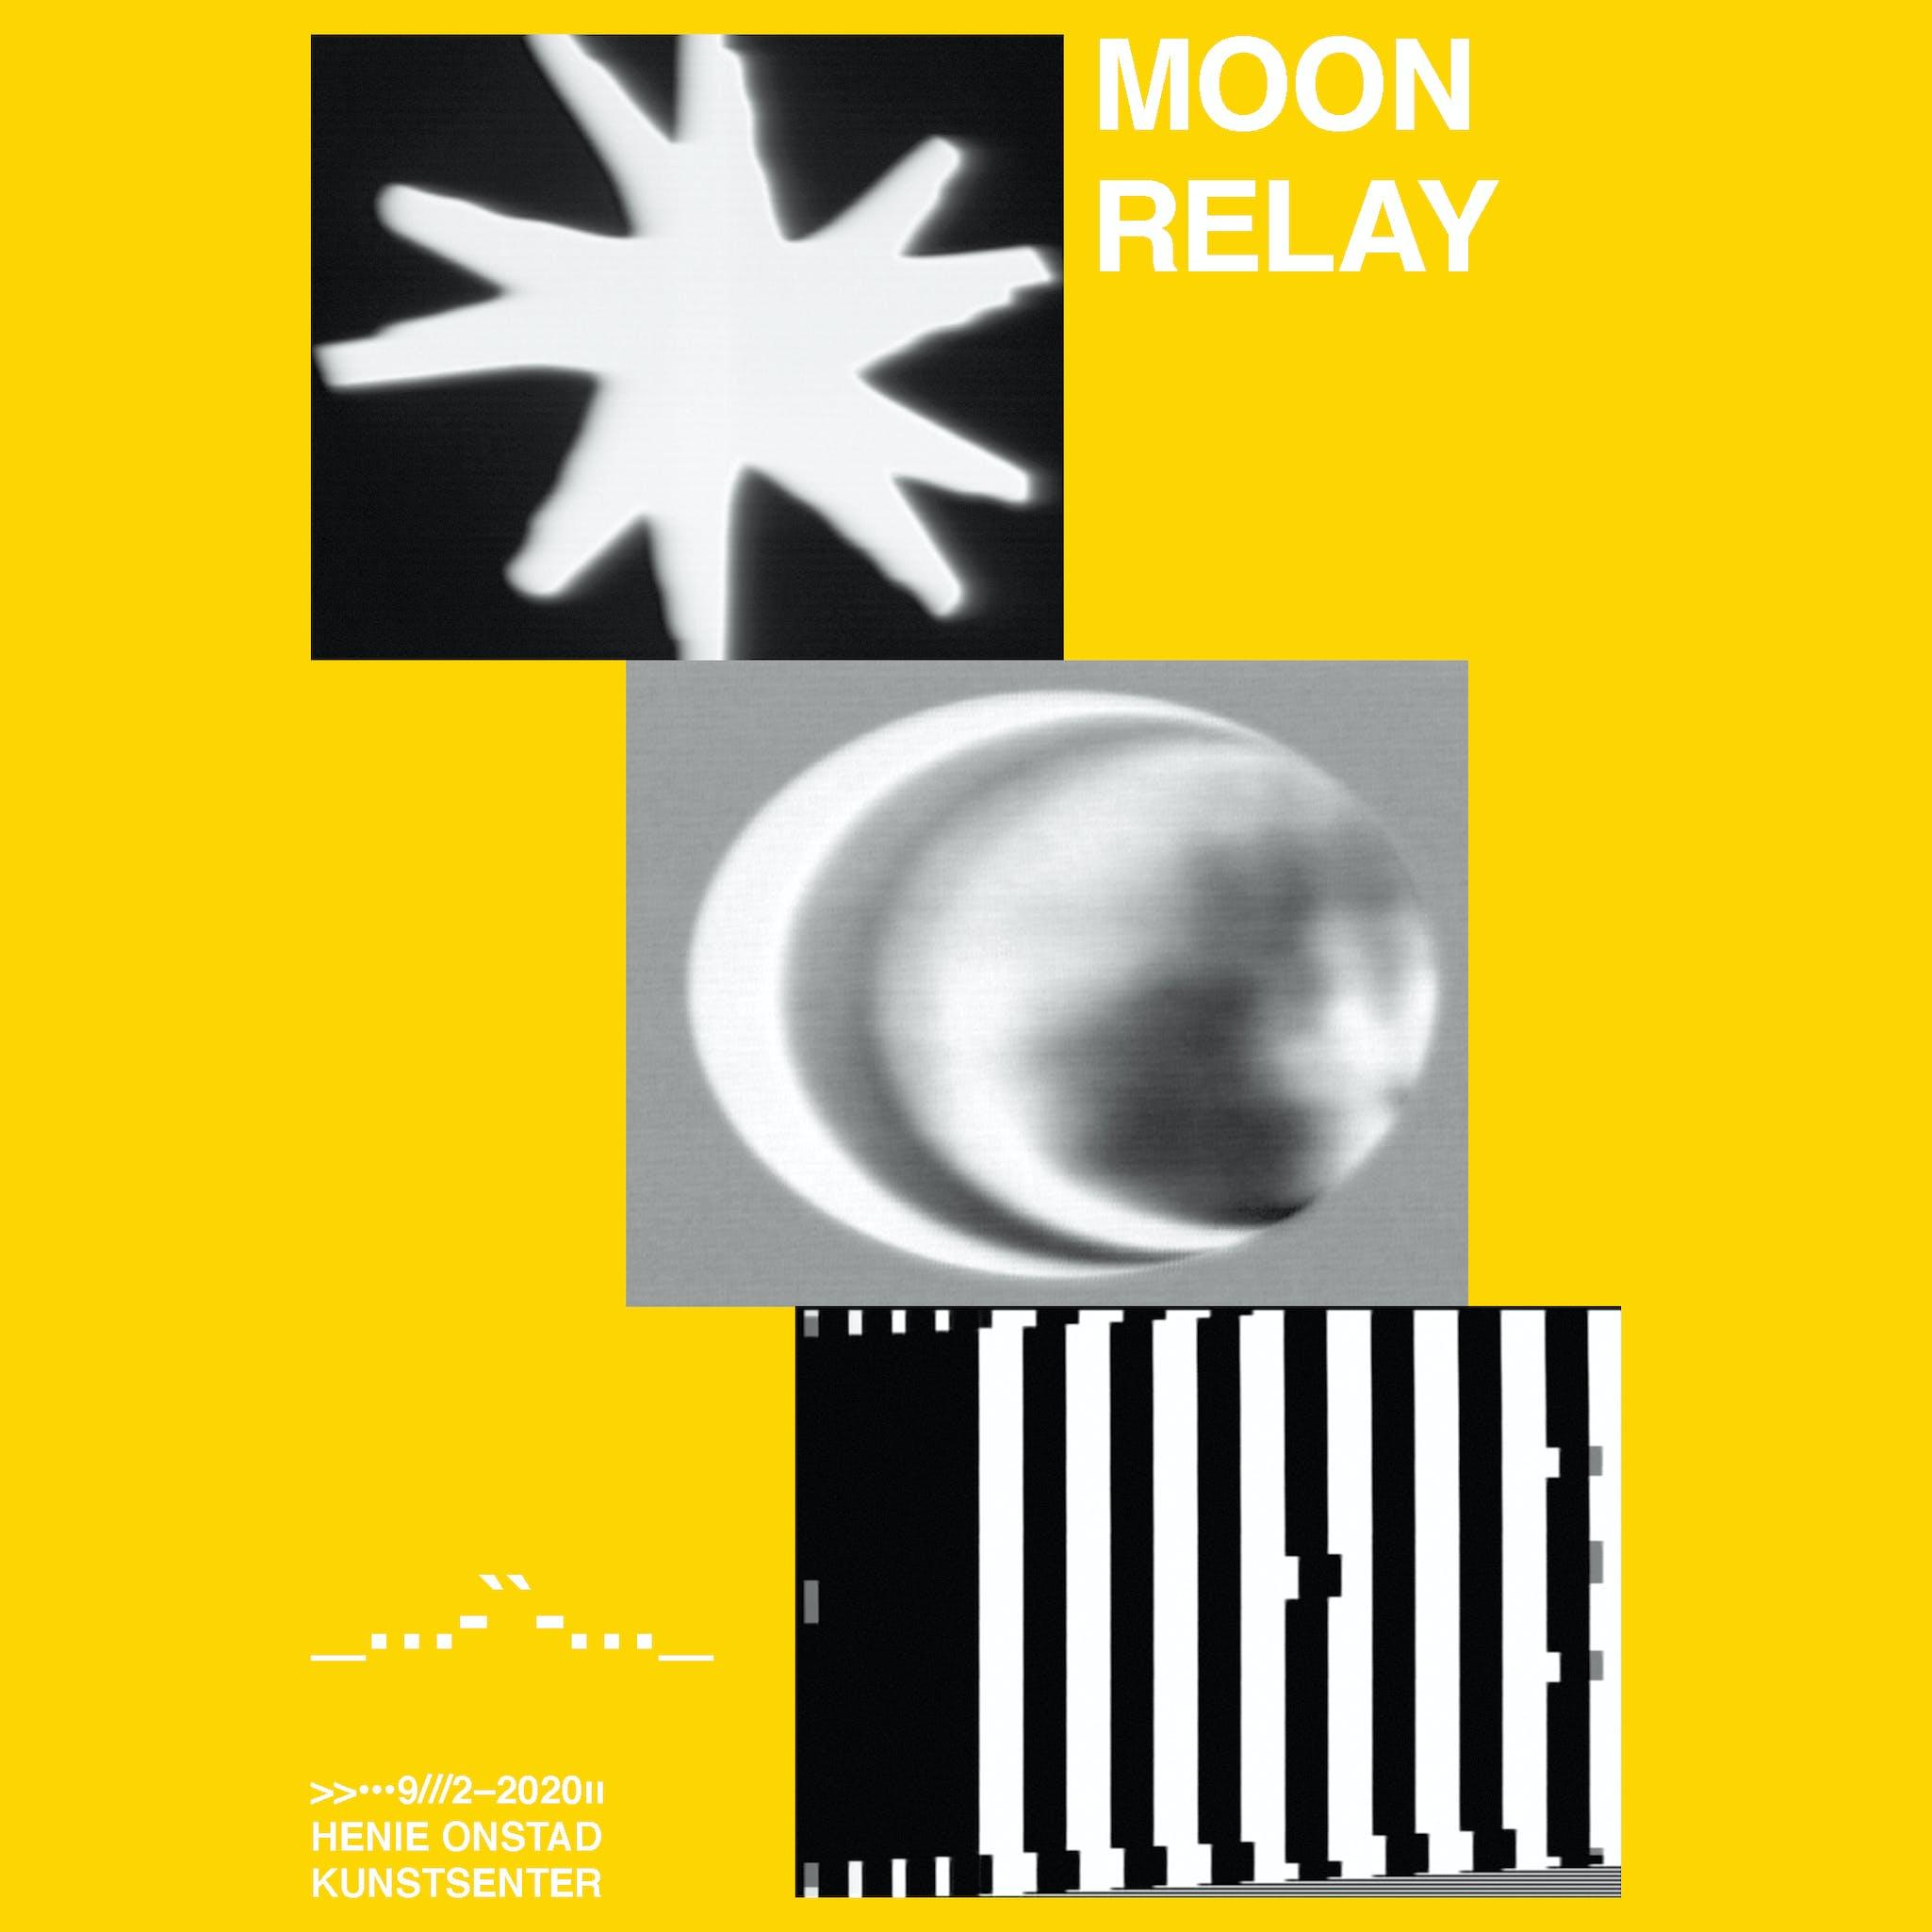 Moon Relay HOK 2020 some IG2